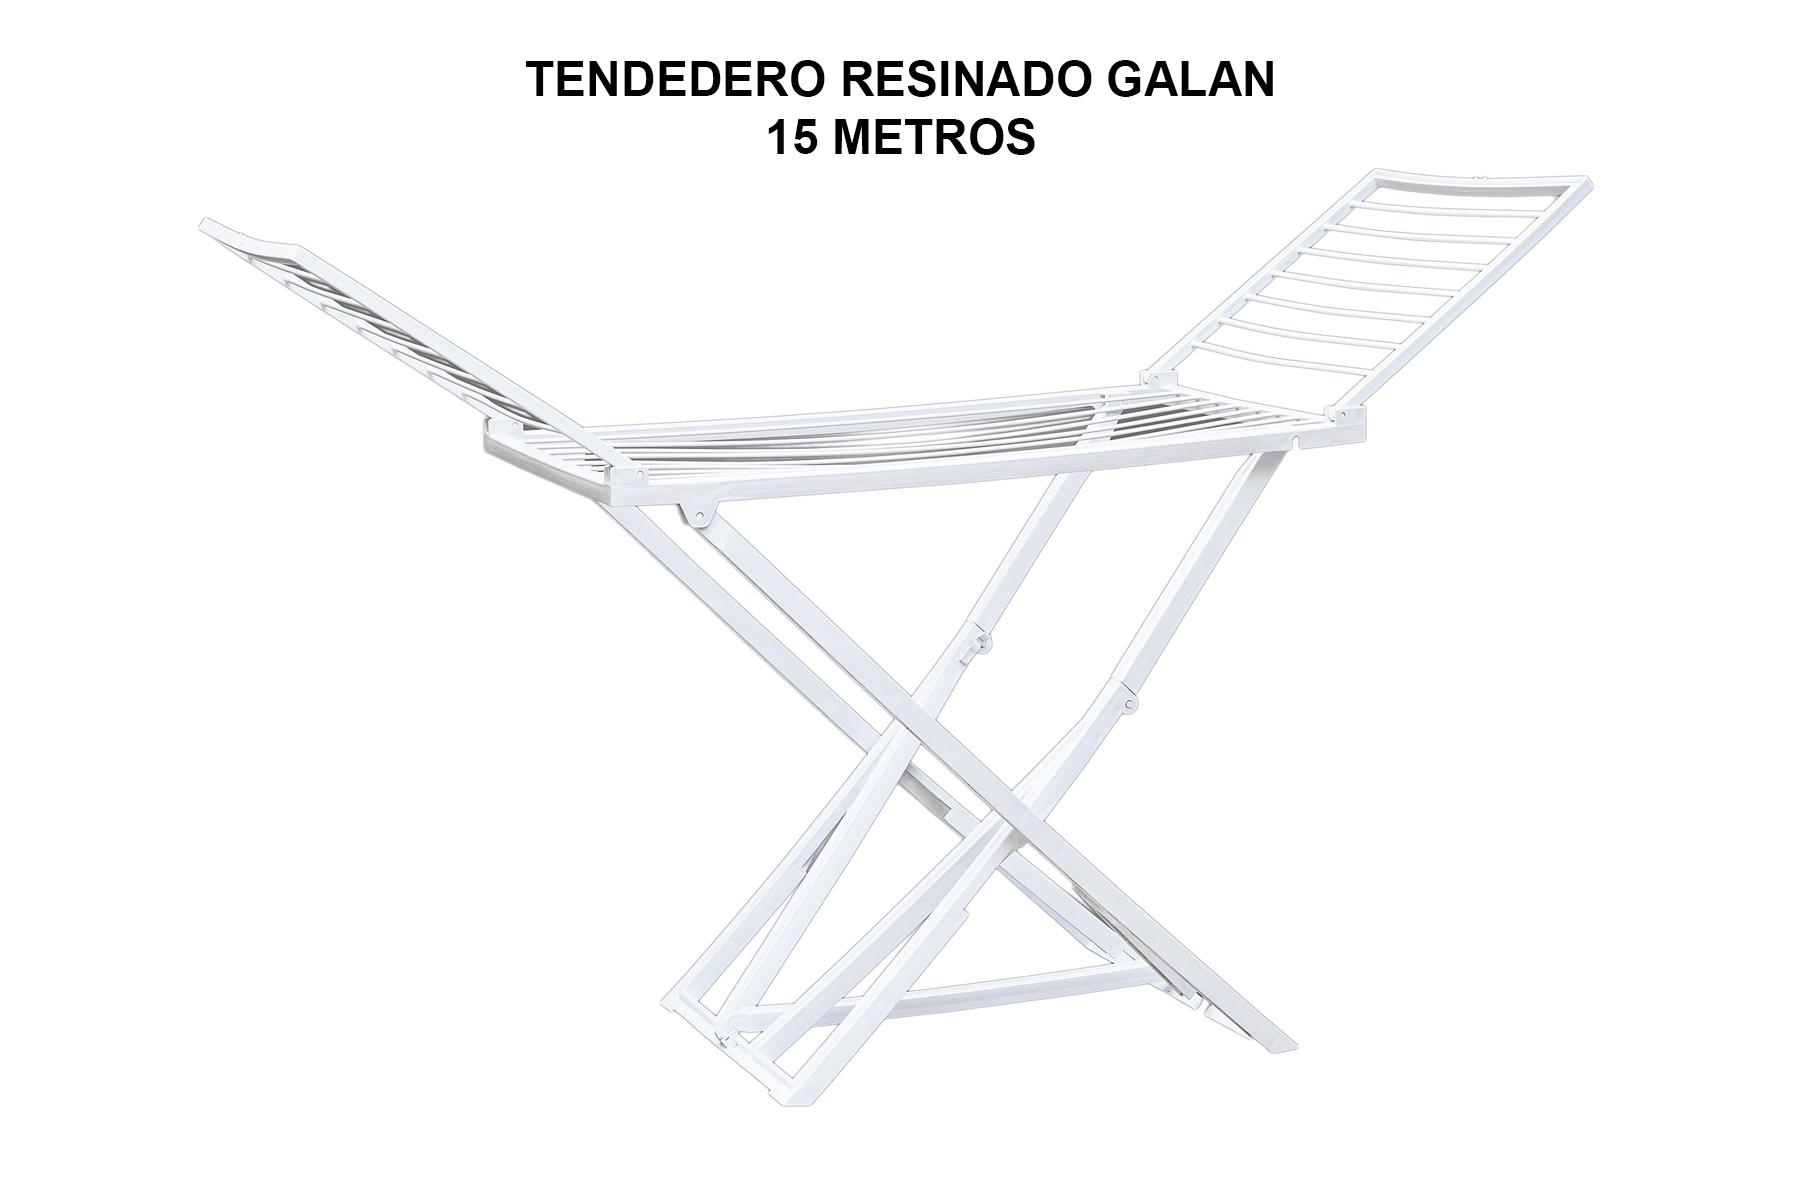 TENDEDERO RESINADO GALAN